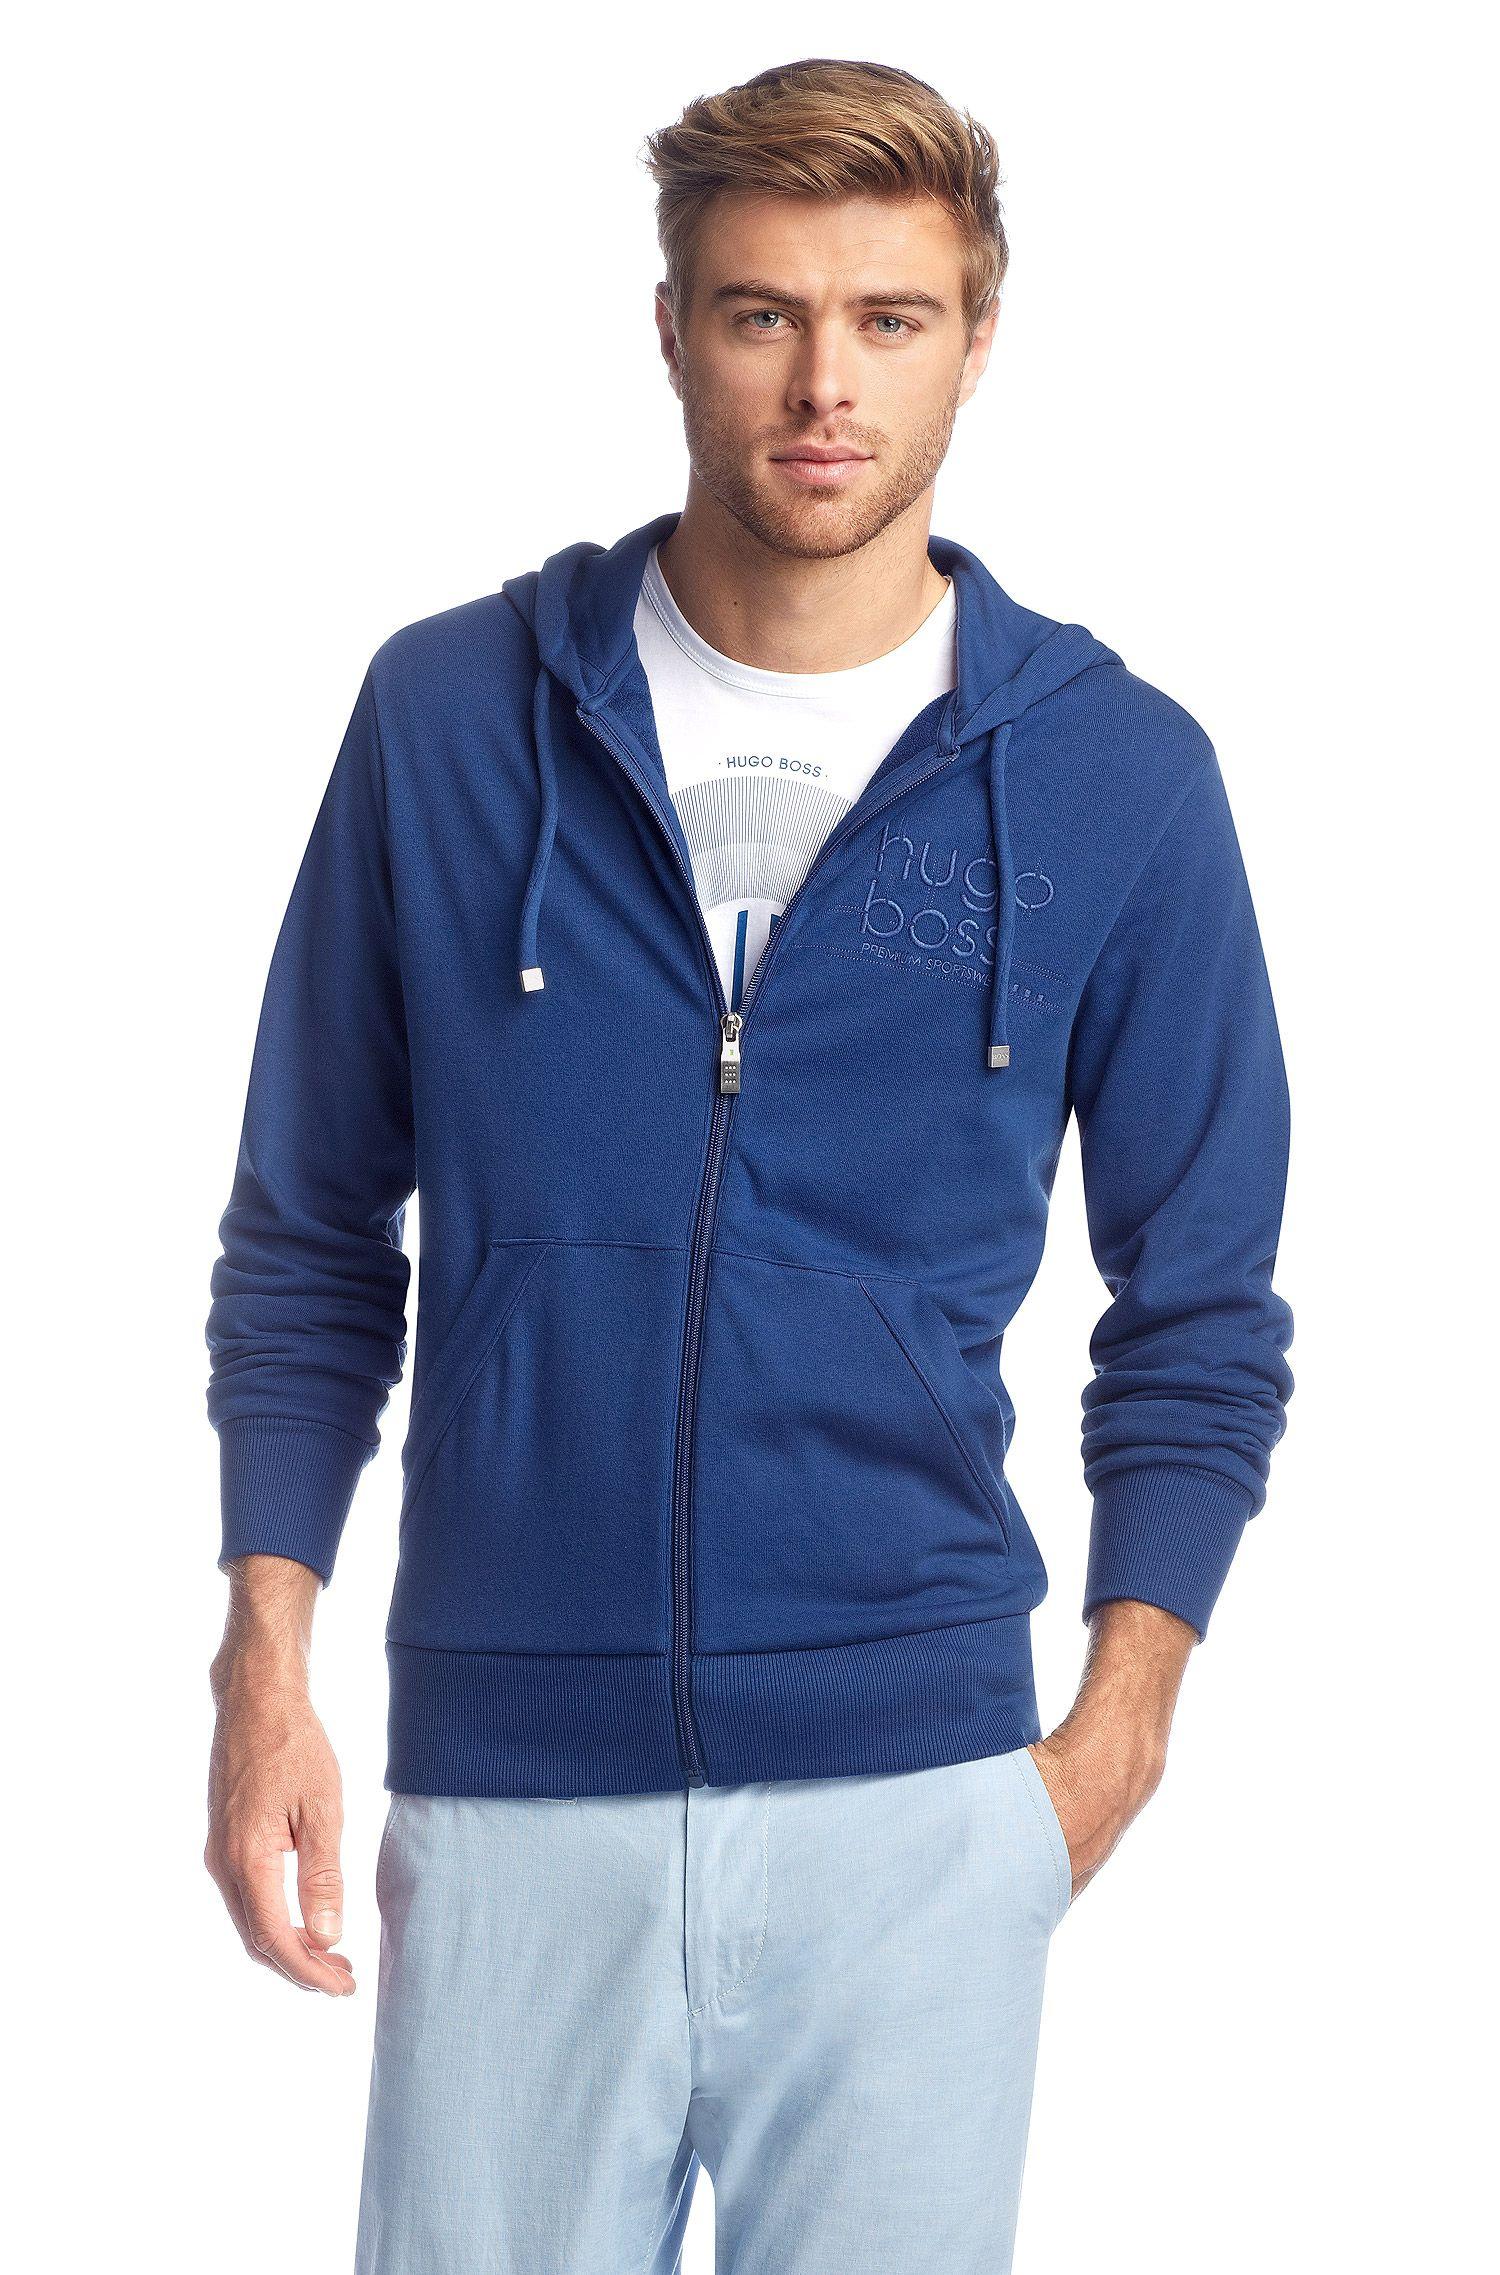 Sweatshirt-Jacke ´Saggos` aus reiner Baumwolle